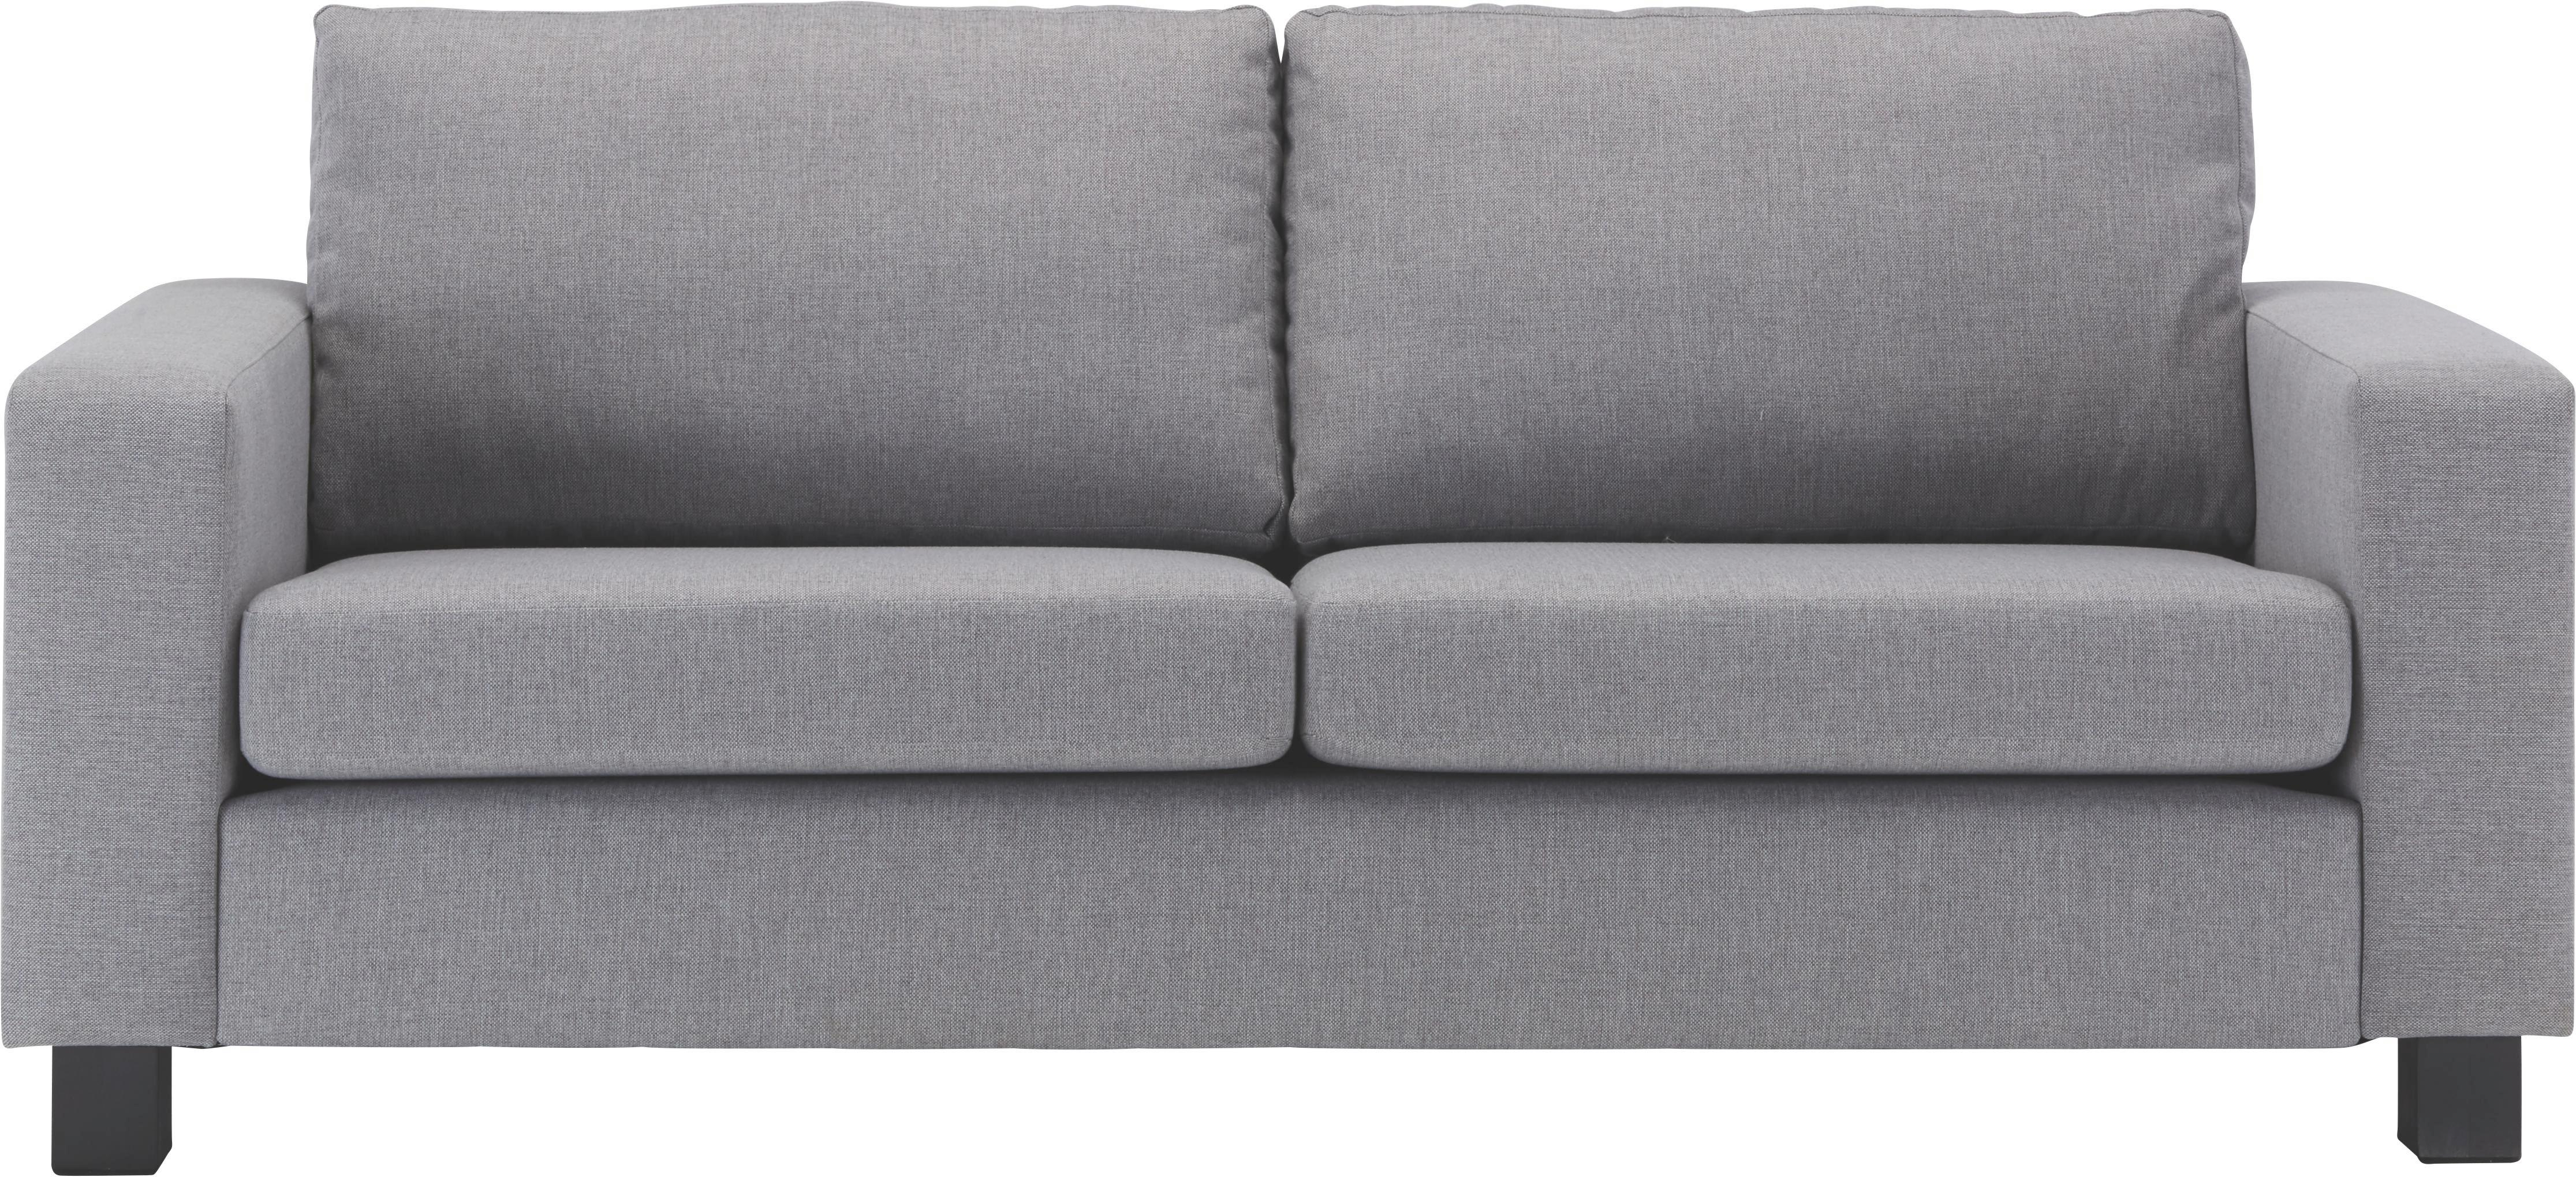 Bezaubernd Sofaecke Grau Foto Von Beautiful Modern With Sofa Modern